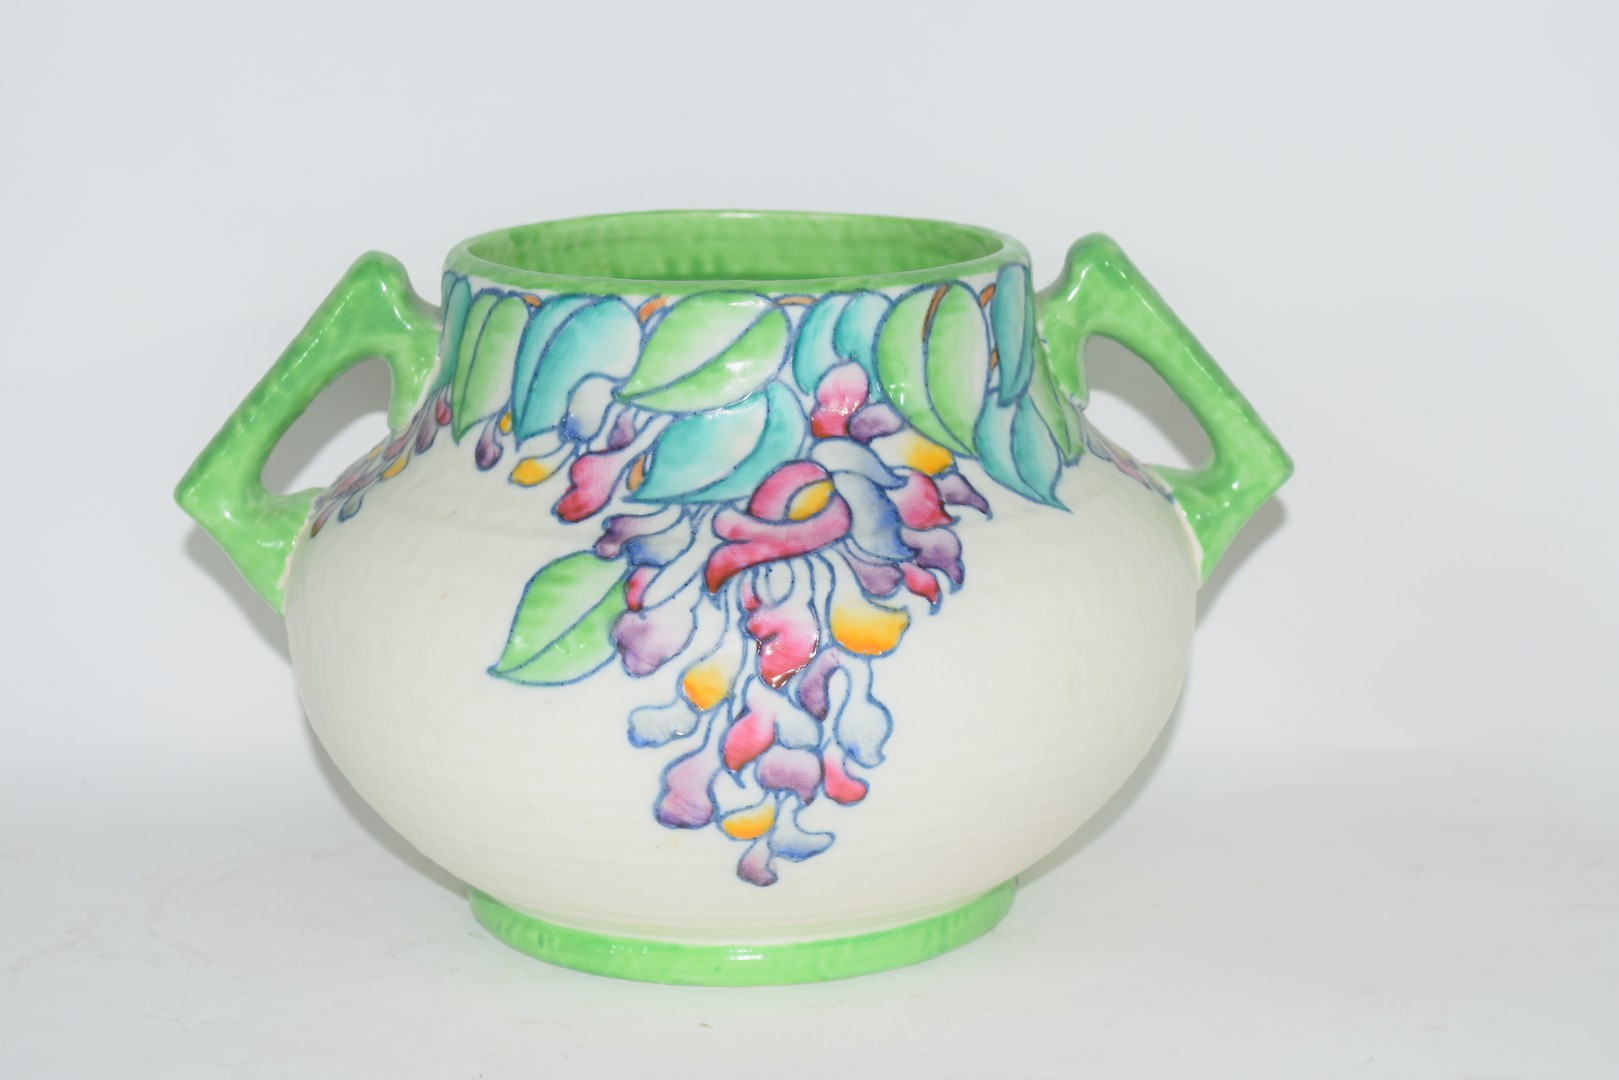 Charlotte Rhead vase pattern no 4954 - Image 3 of 6